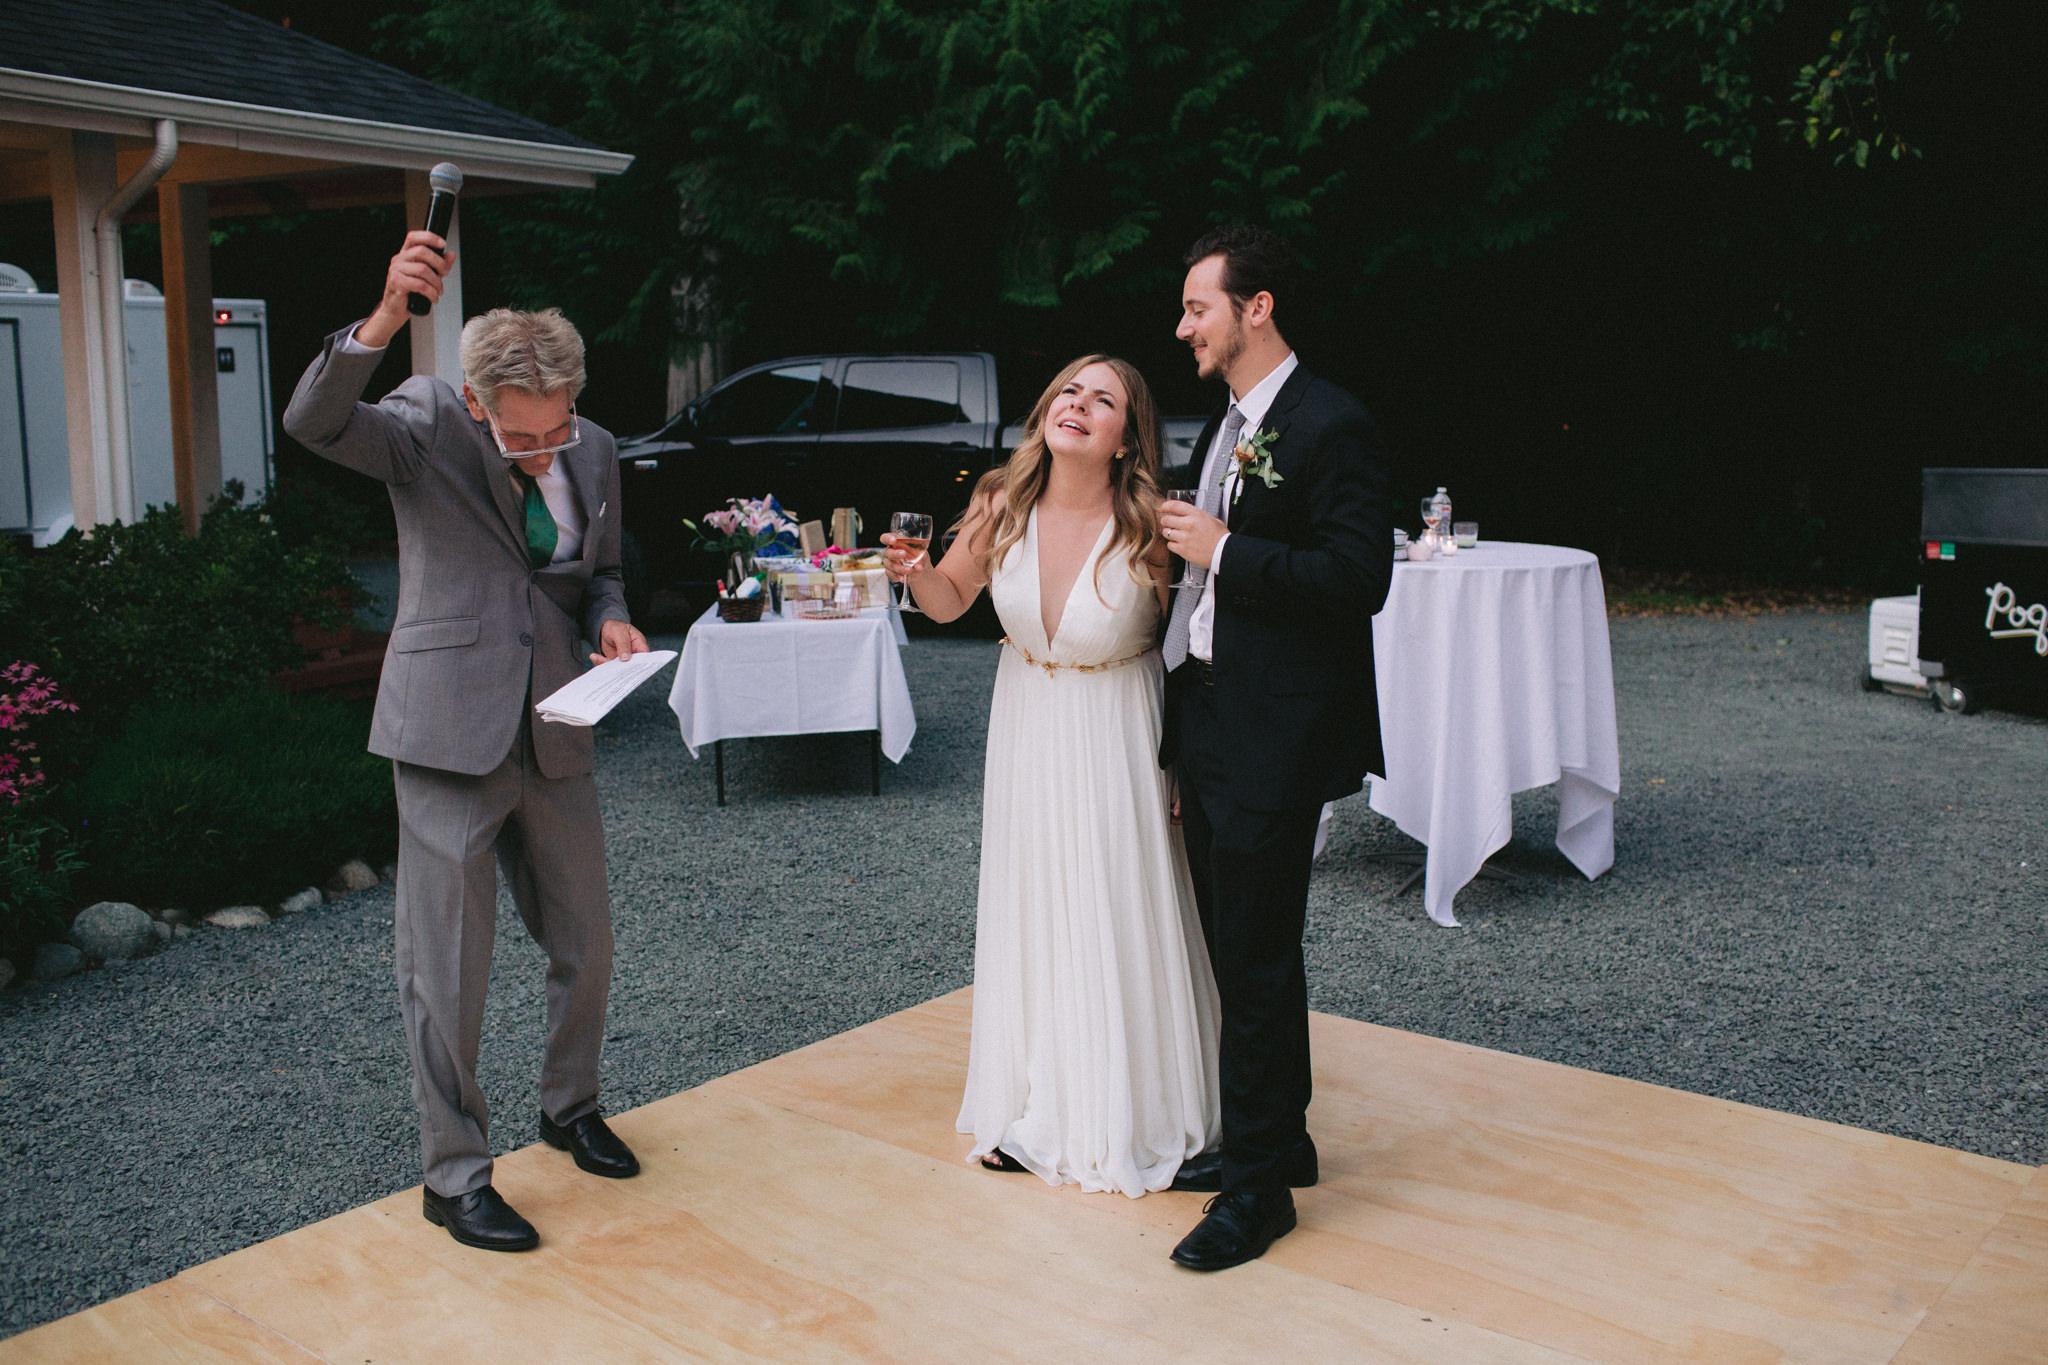 Backyard-Bainbridge-Island-Wedding-Alycia-Lovell-Photography-208.JPG